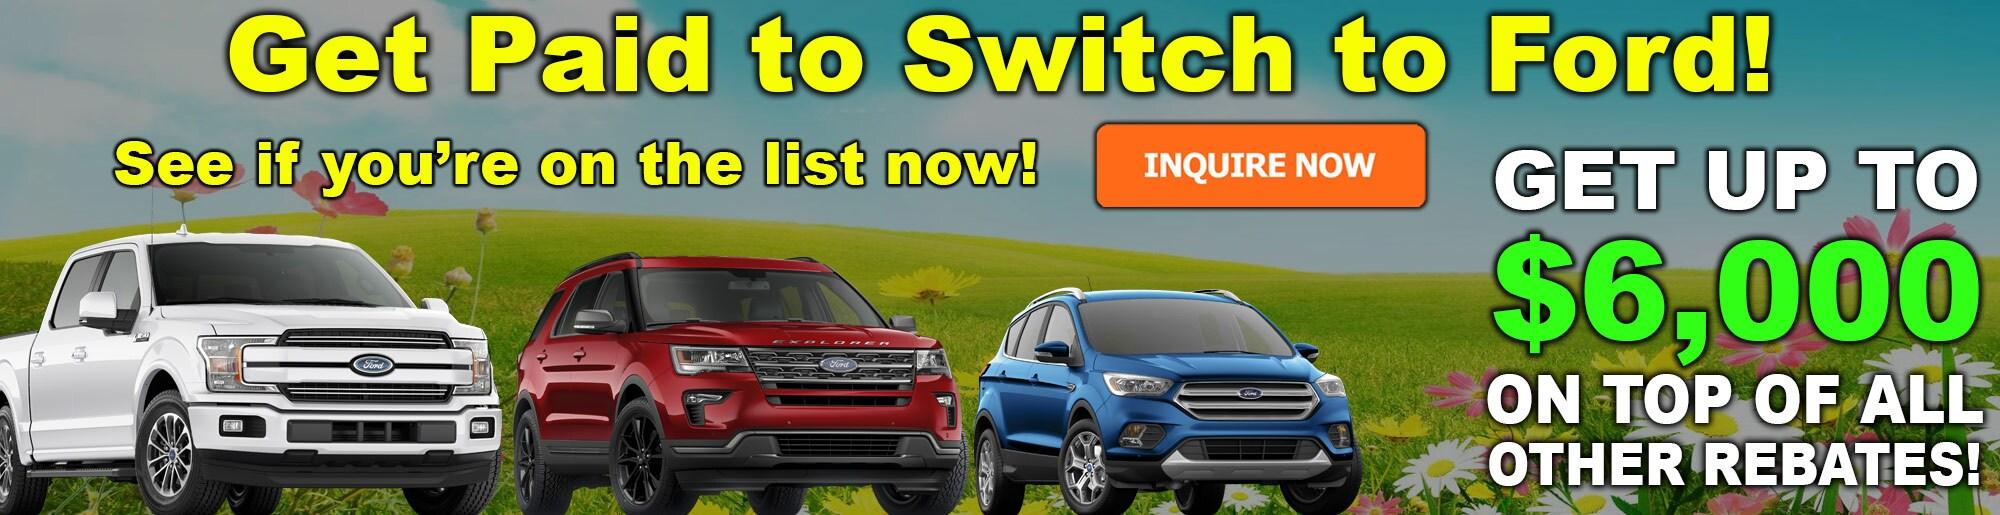 Lasco Ford Grand Blanc >> New Ford & Used Car Dealer in Fenton, MI - Lasco Ford